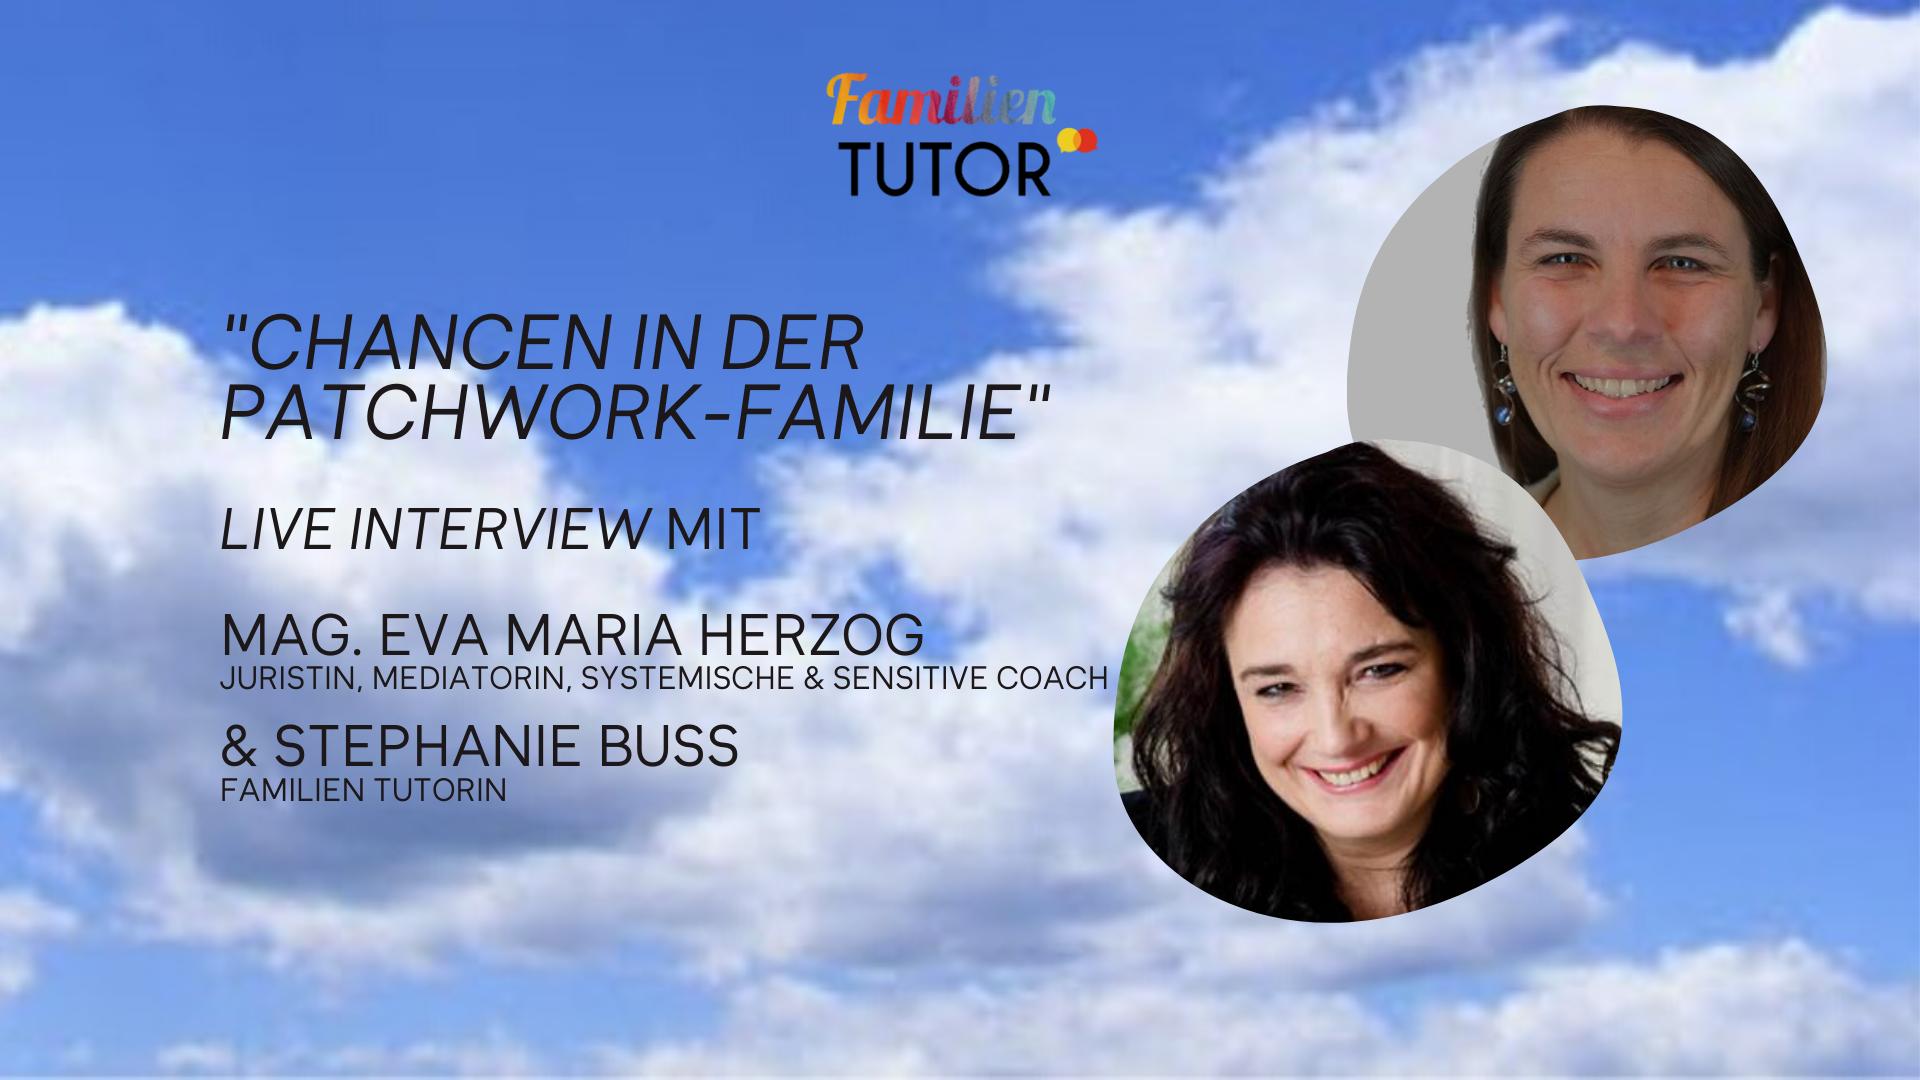 Family Friday Tutorial mit Eva Maria Herzog